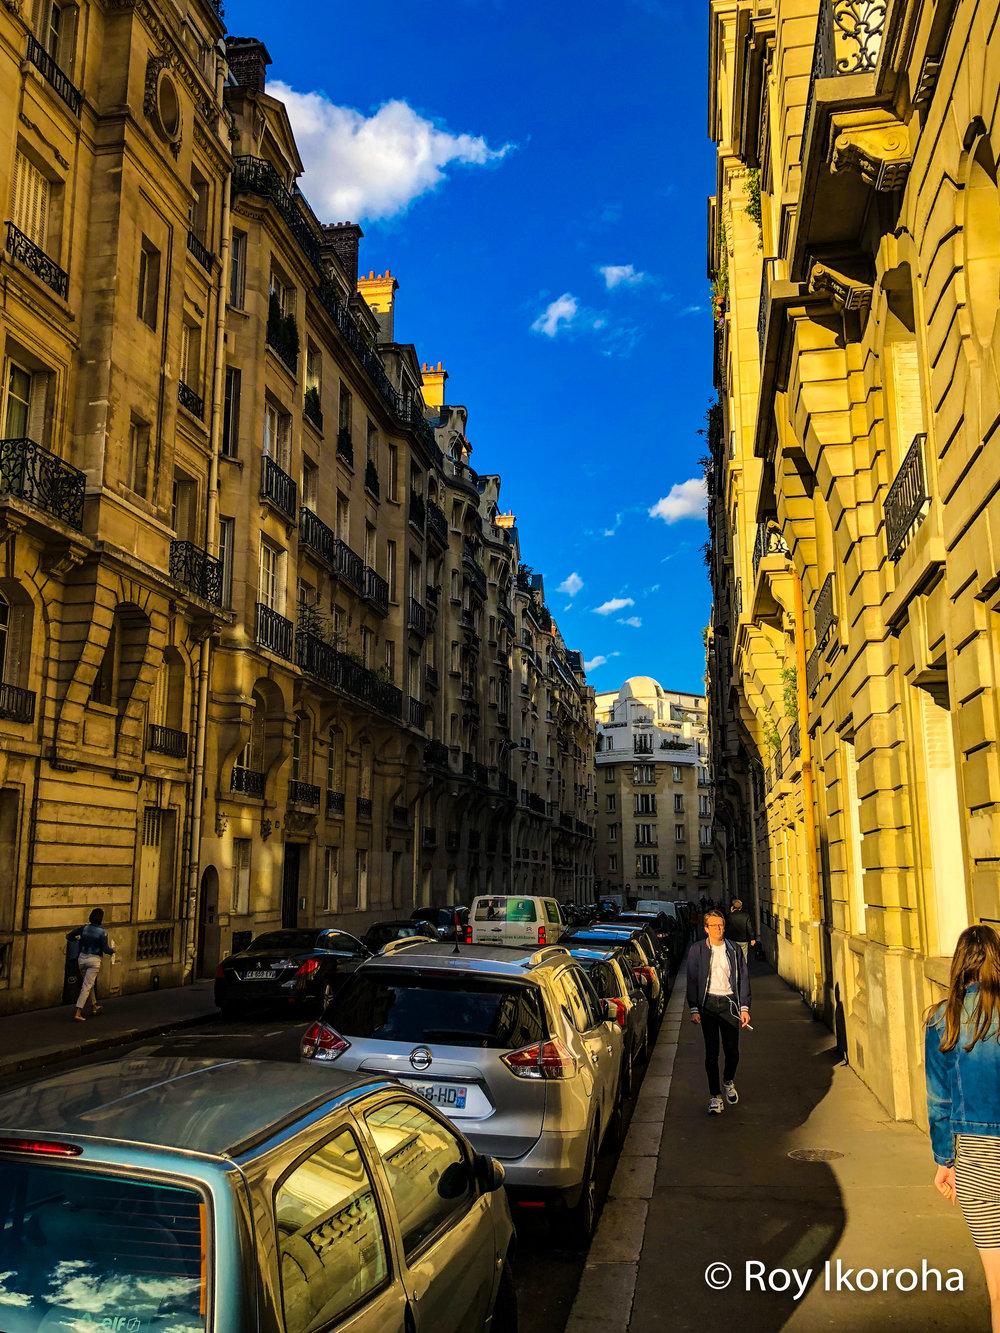 Parisian streets, Paris